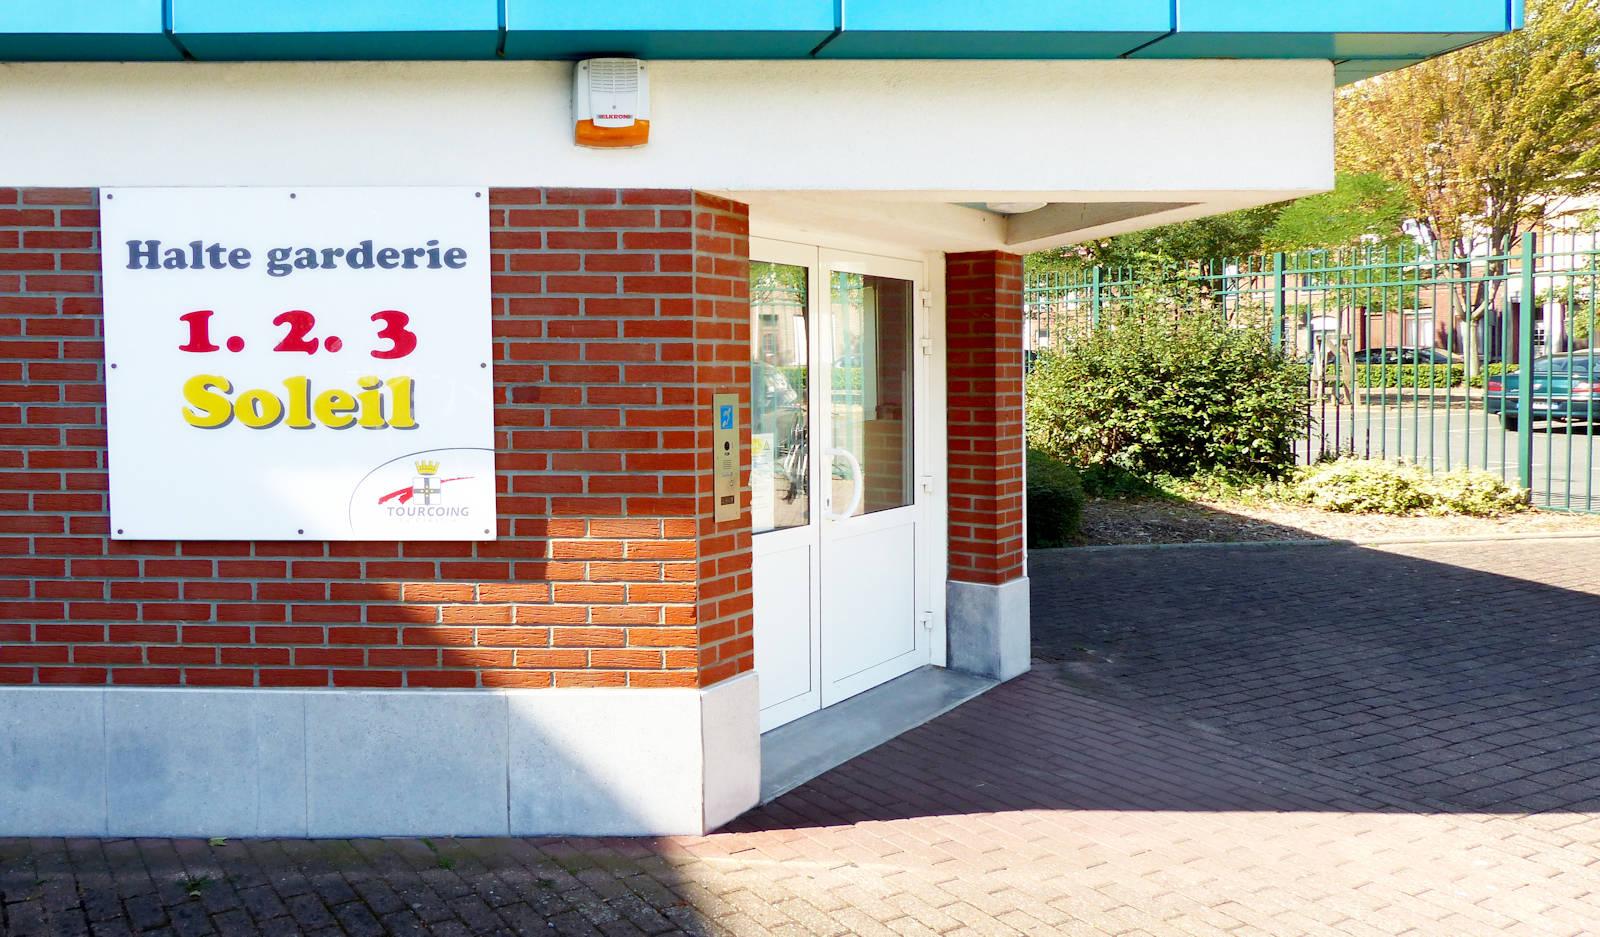 Crèches, Garderies Tourcoing - 1, 2, 3 Soleil Halte Garderie